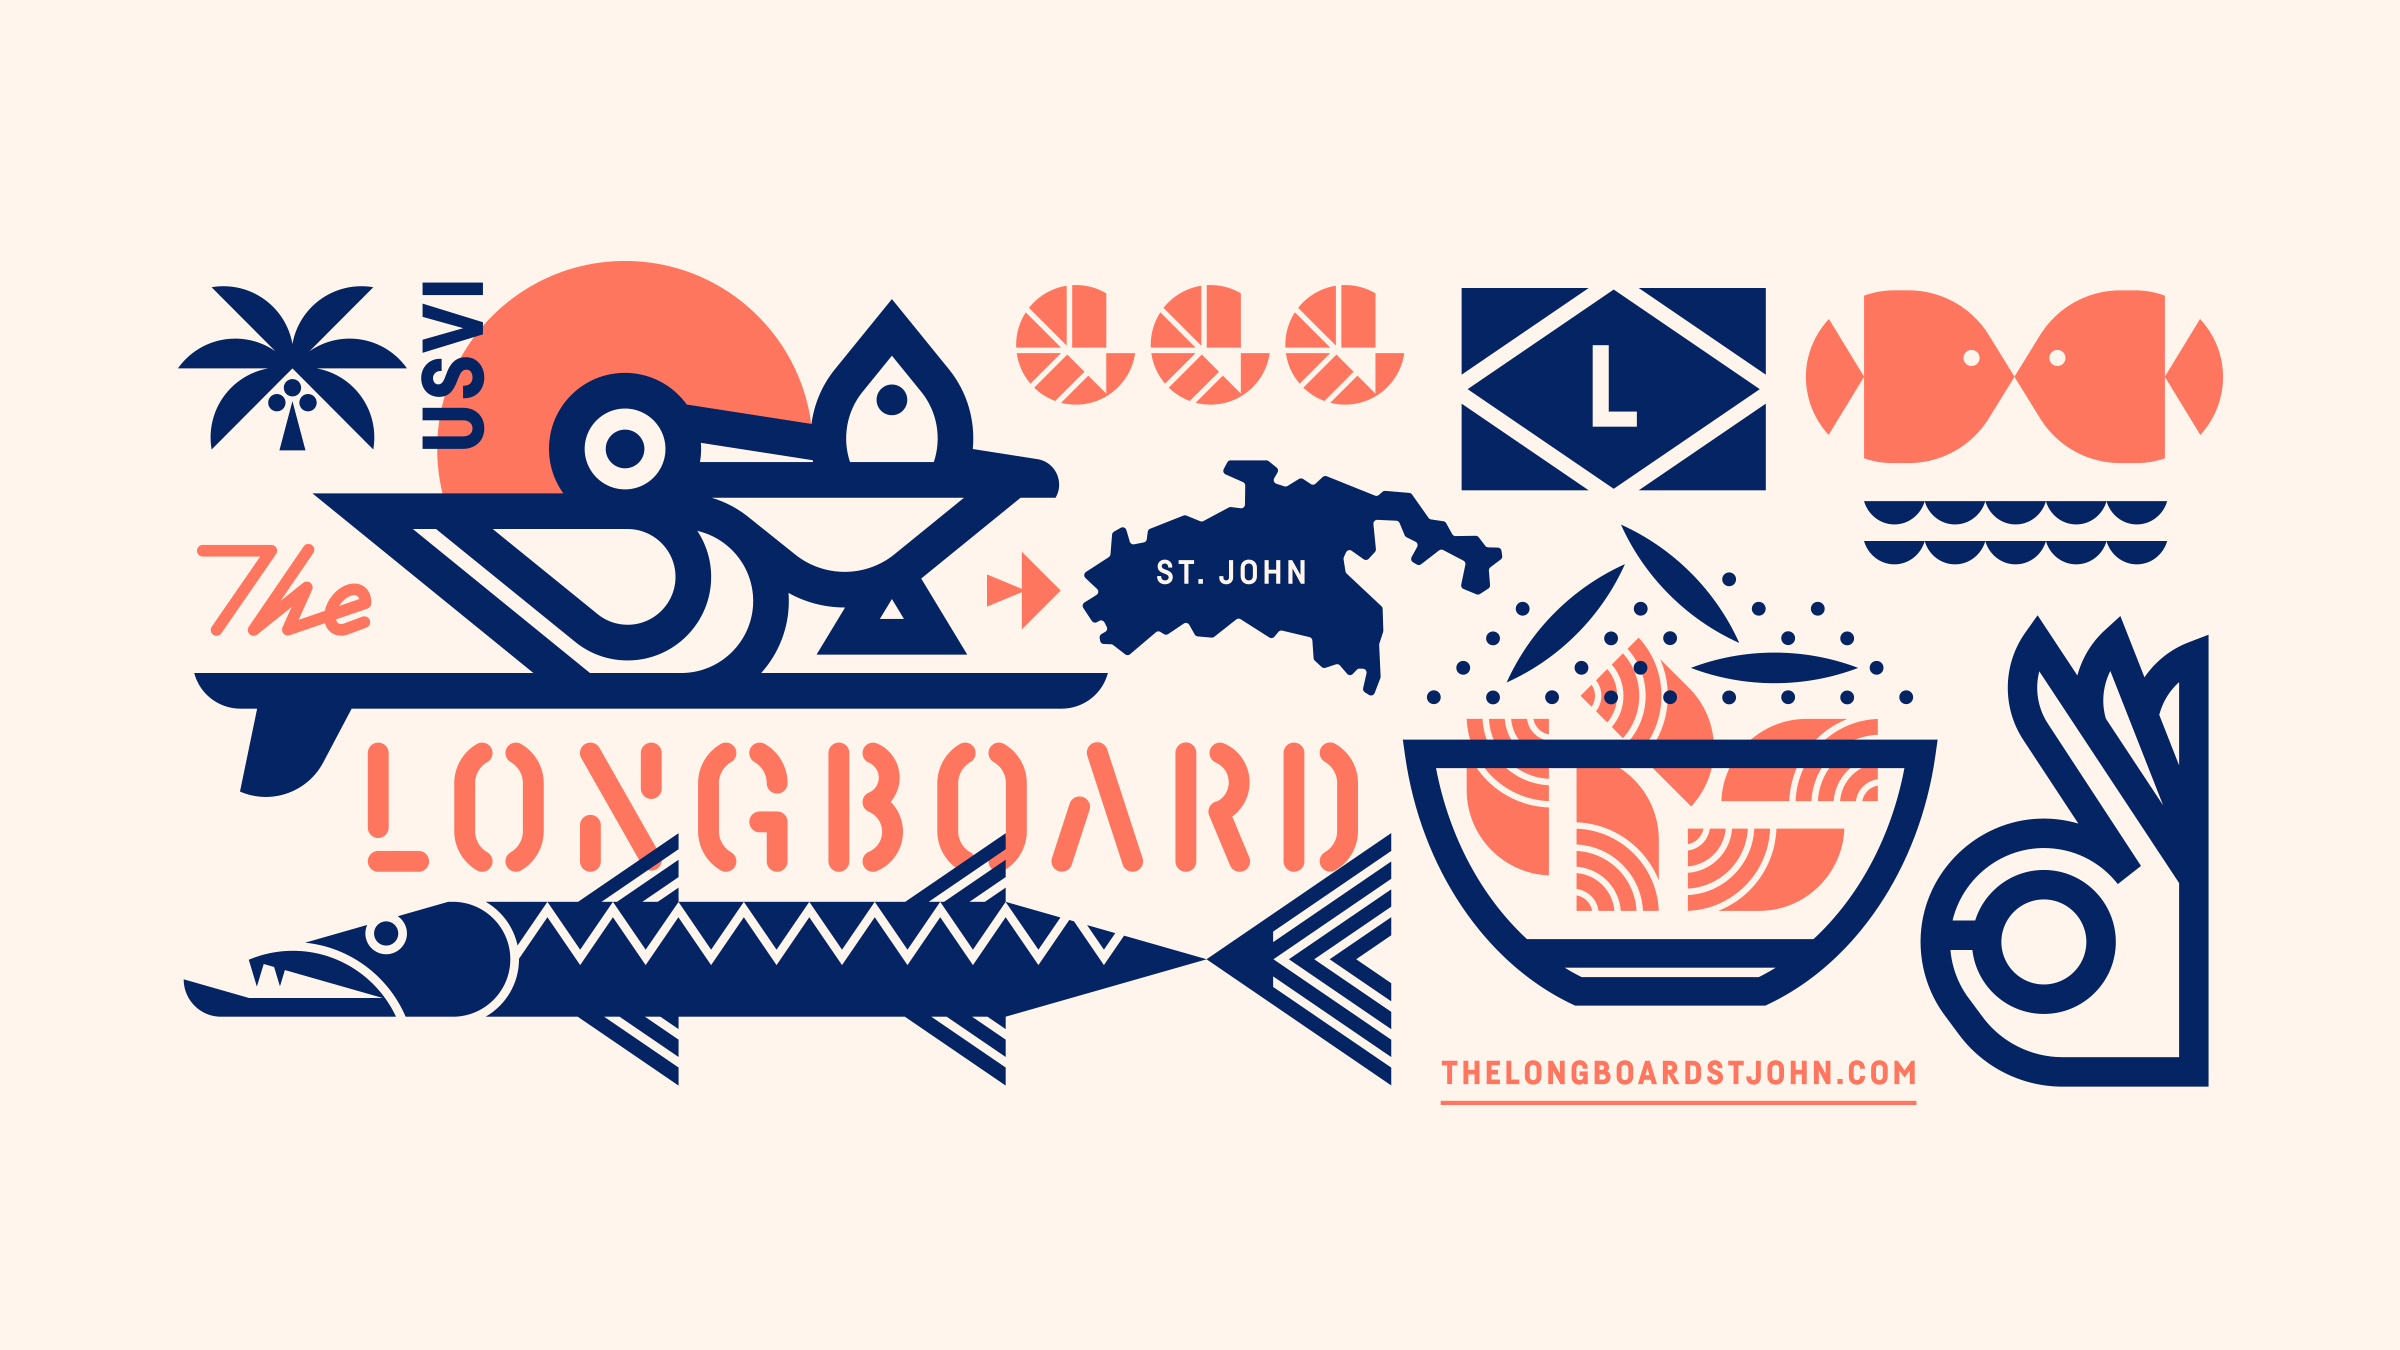 The Longboard Pelican, Flag, Barracuda, and Poké is OK